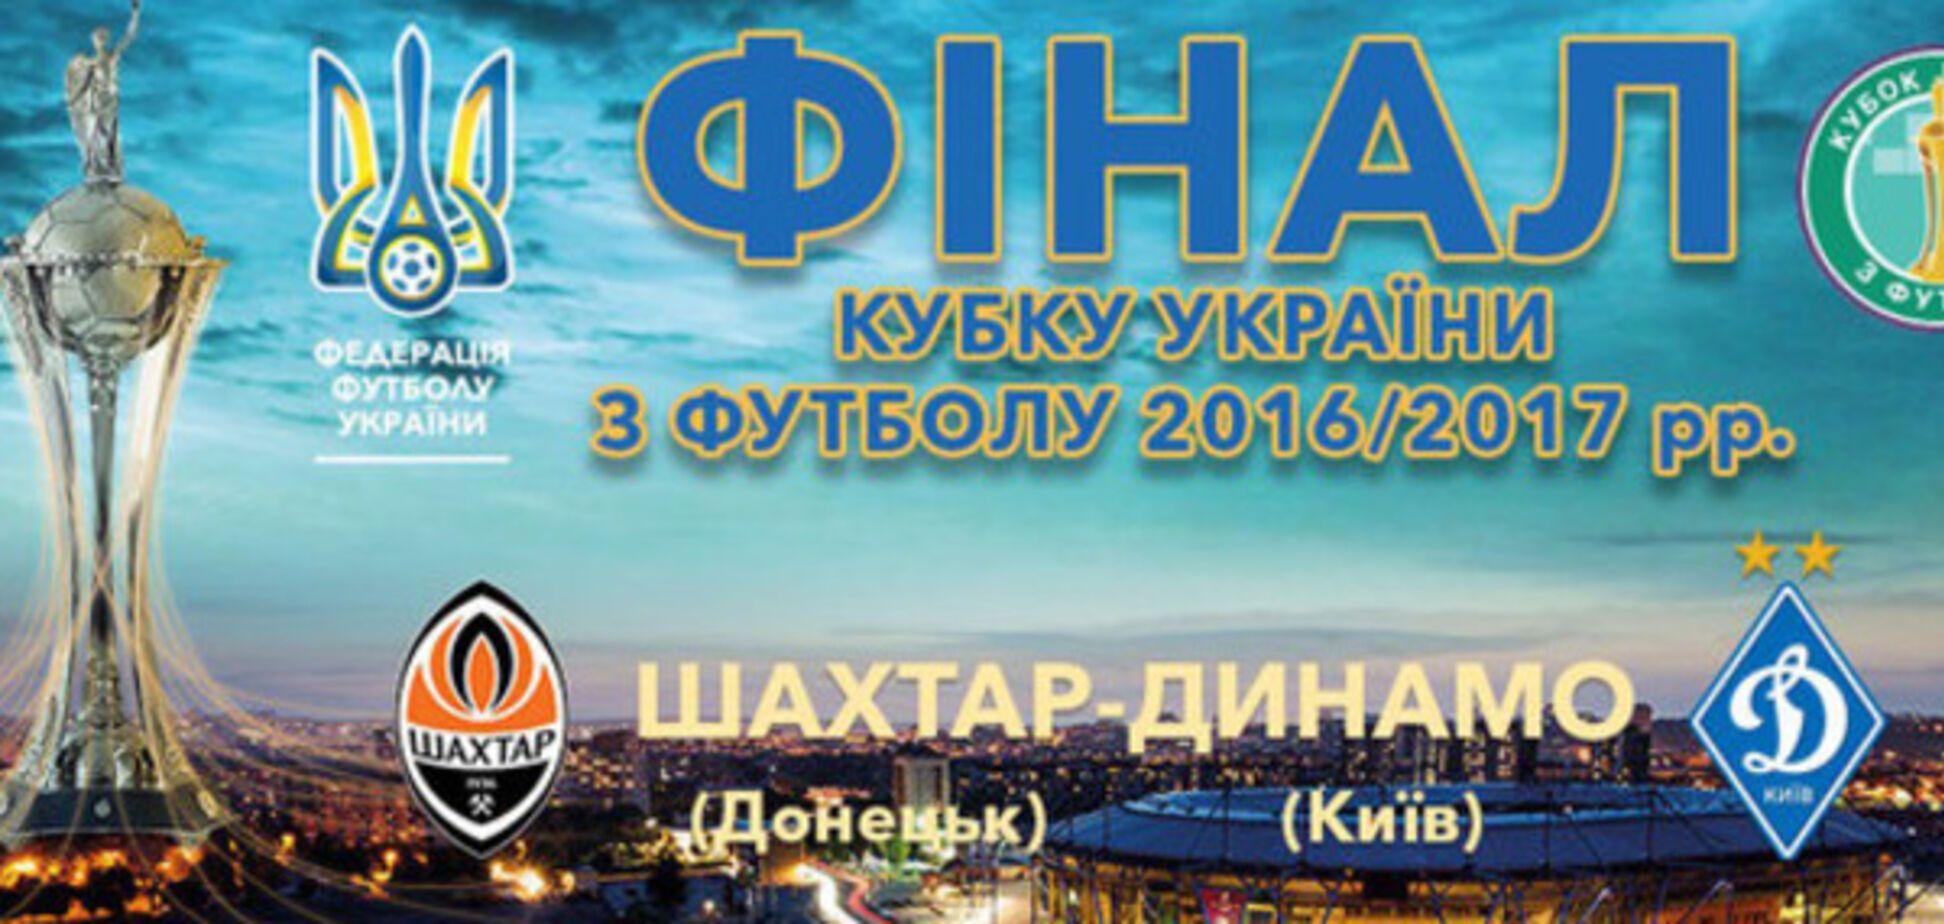 Шахтер Динамо Кубок Украины